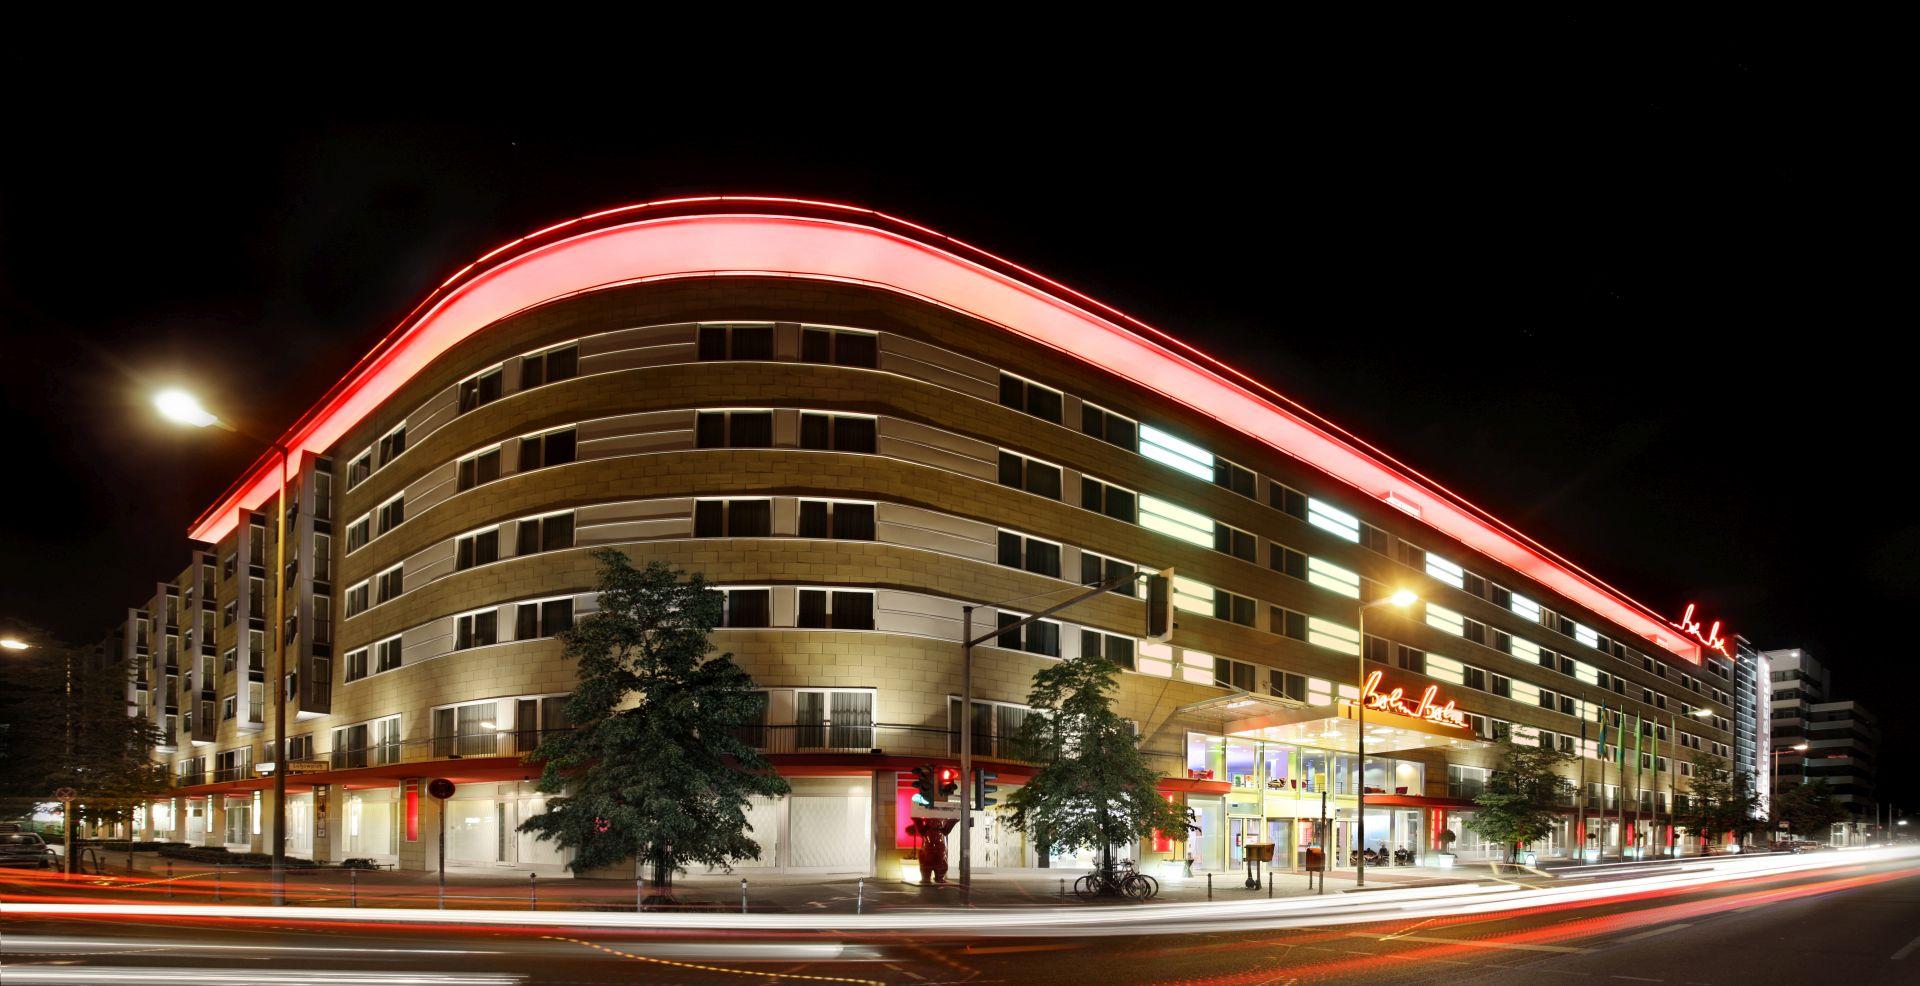 Room Photo 87173 Hotel Goodman S Living Hotel